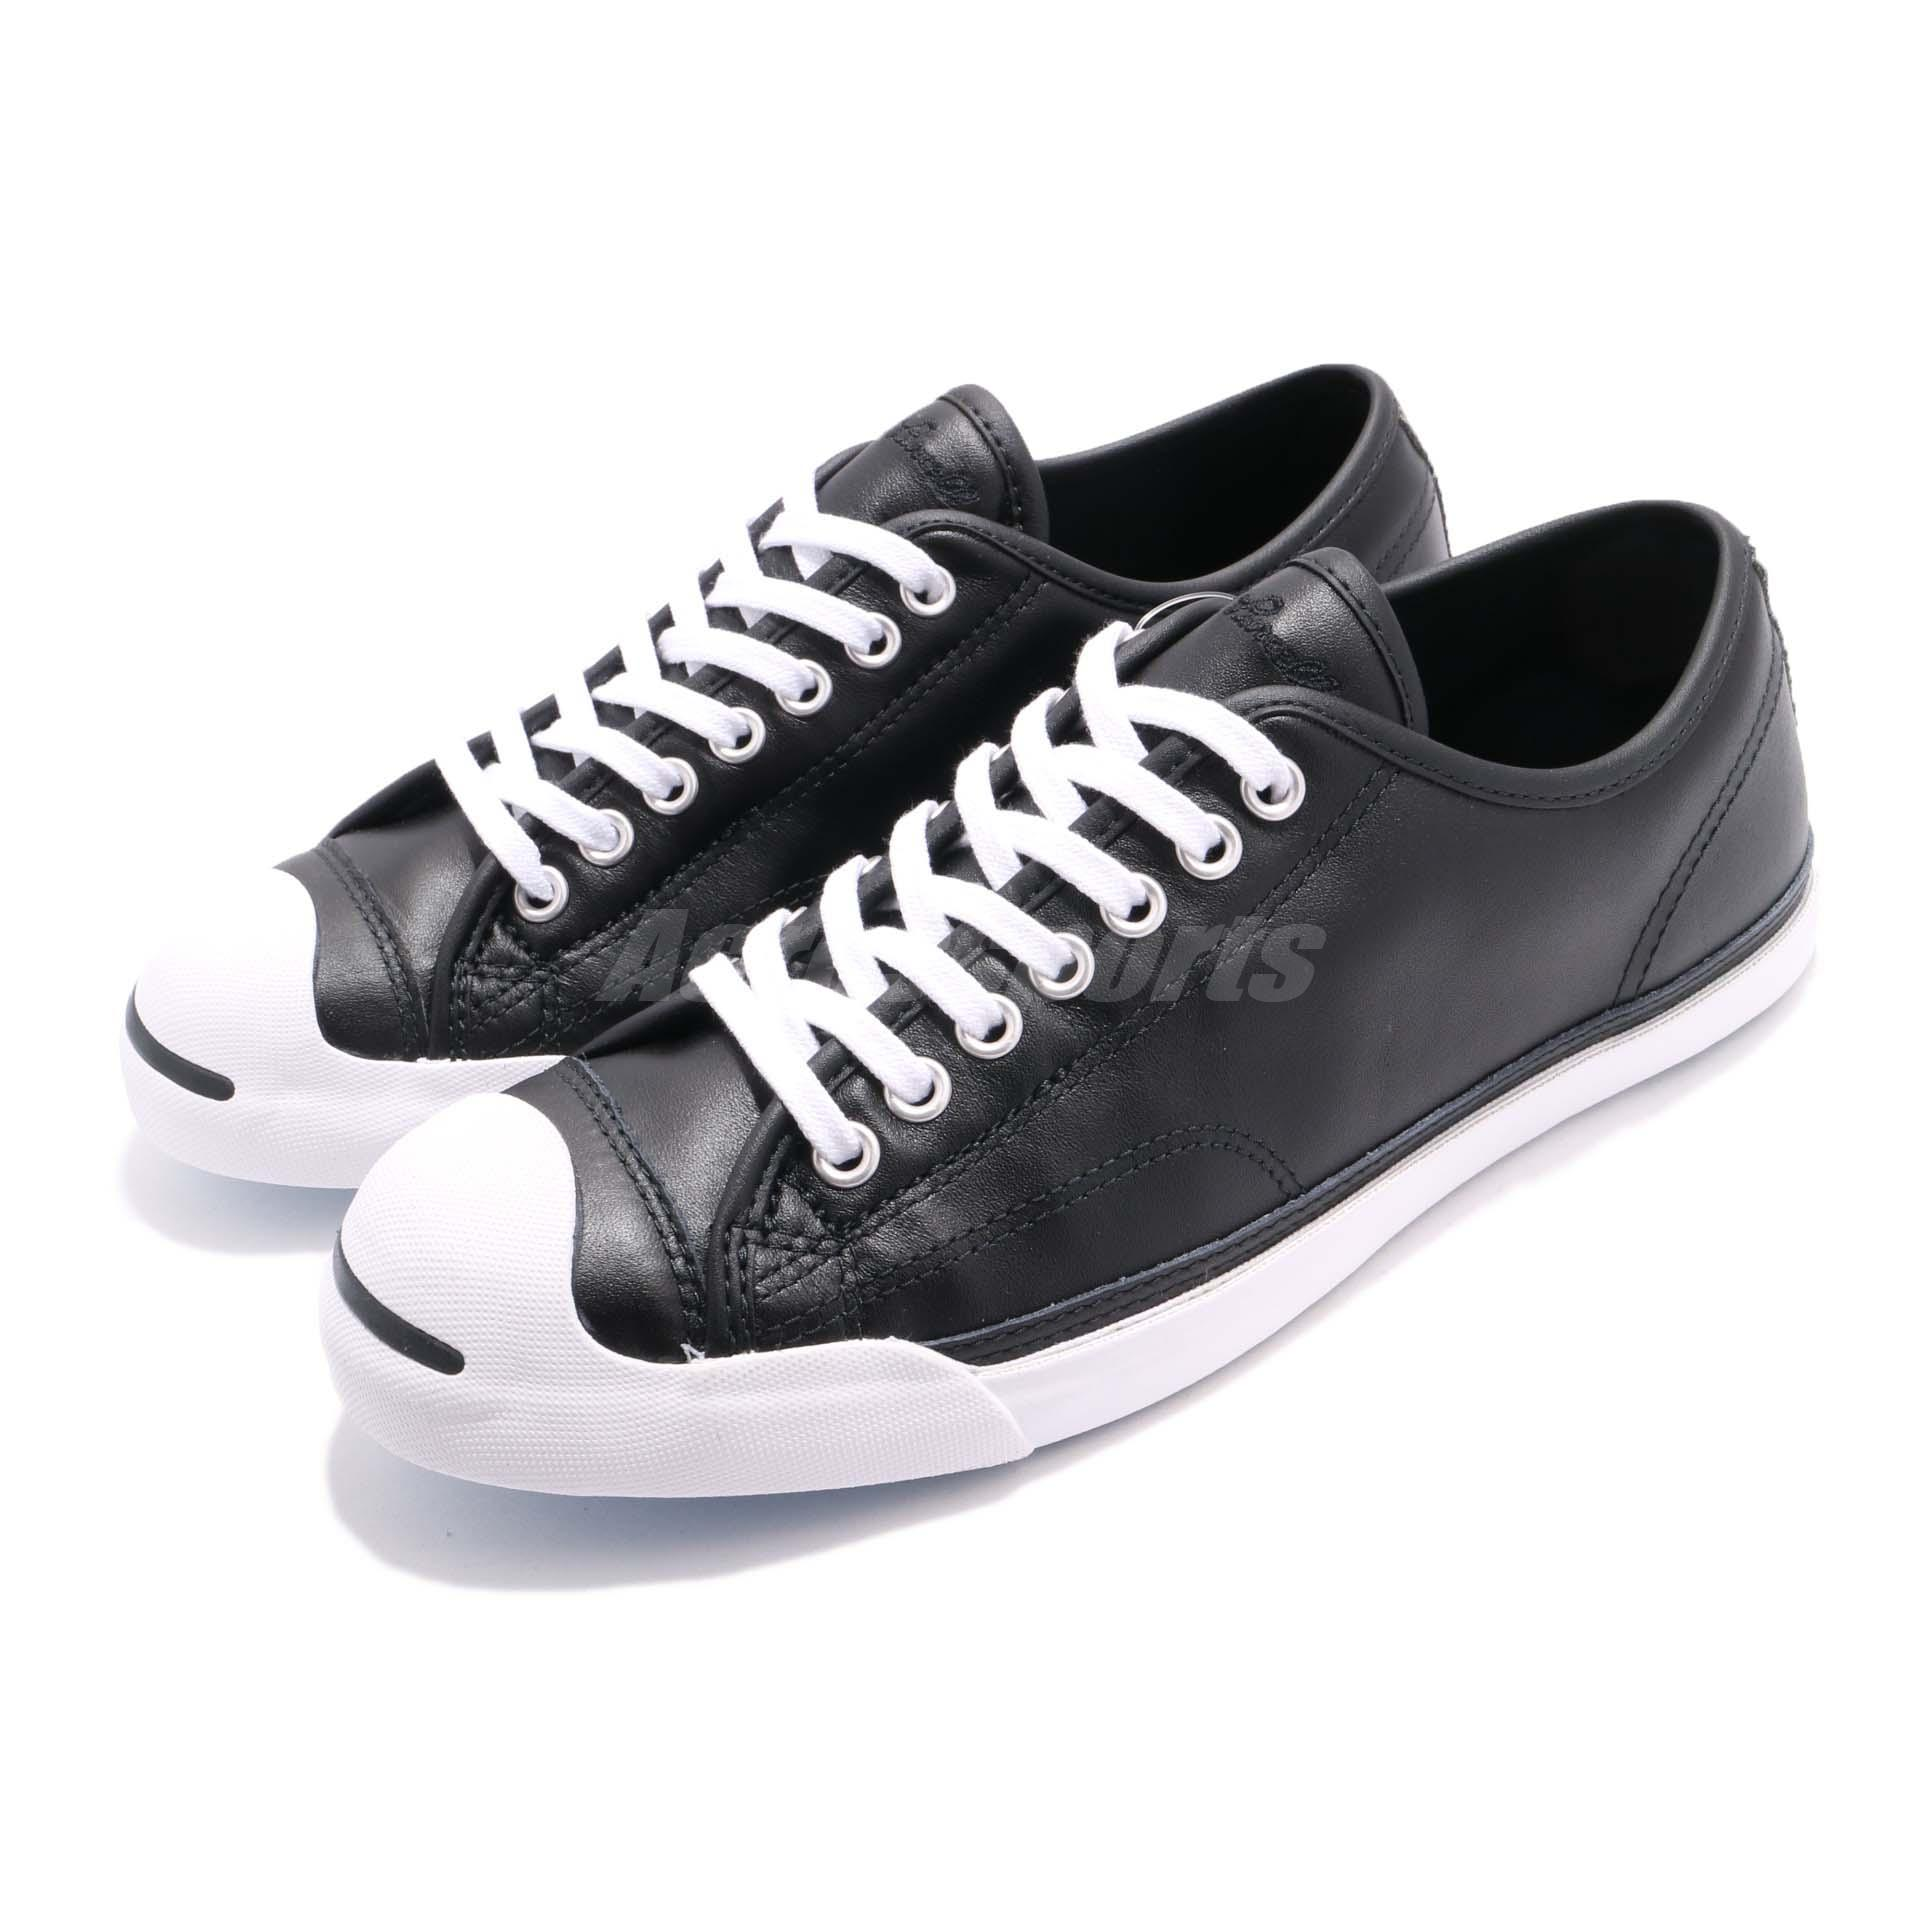 2eed9b8ccef0d2 Details about Converse Jack Purcell LP L S Low Men Classic Shoes Sneakers  158865C